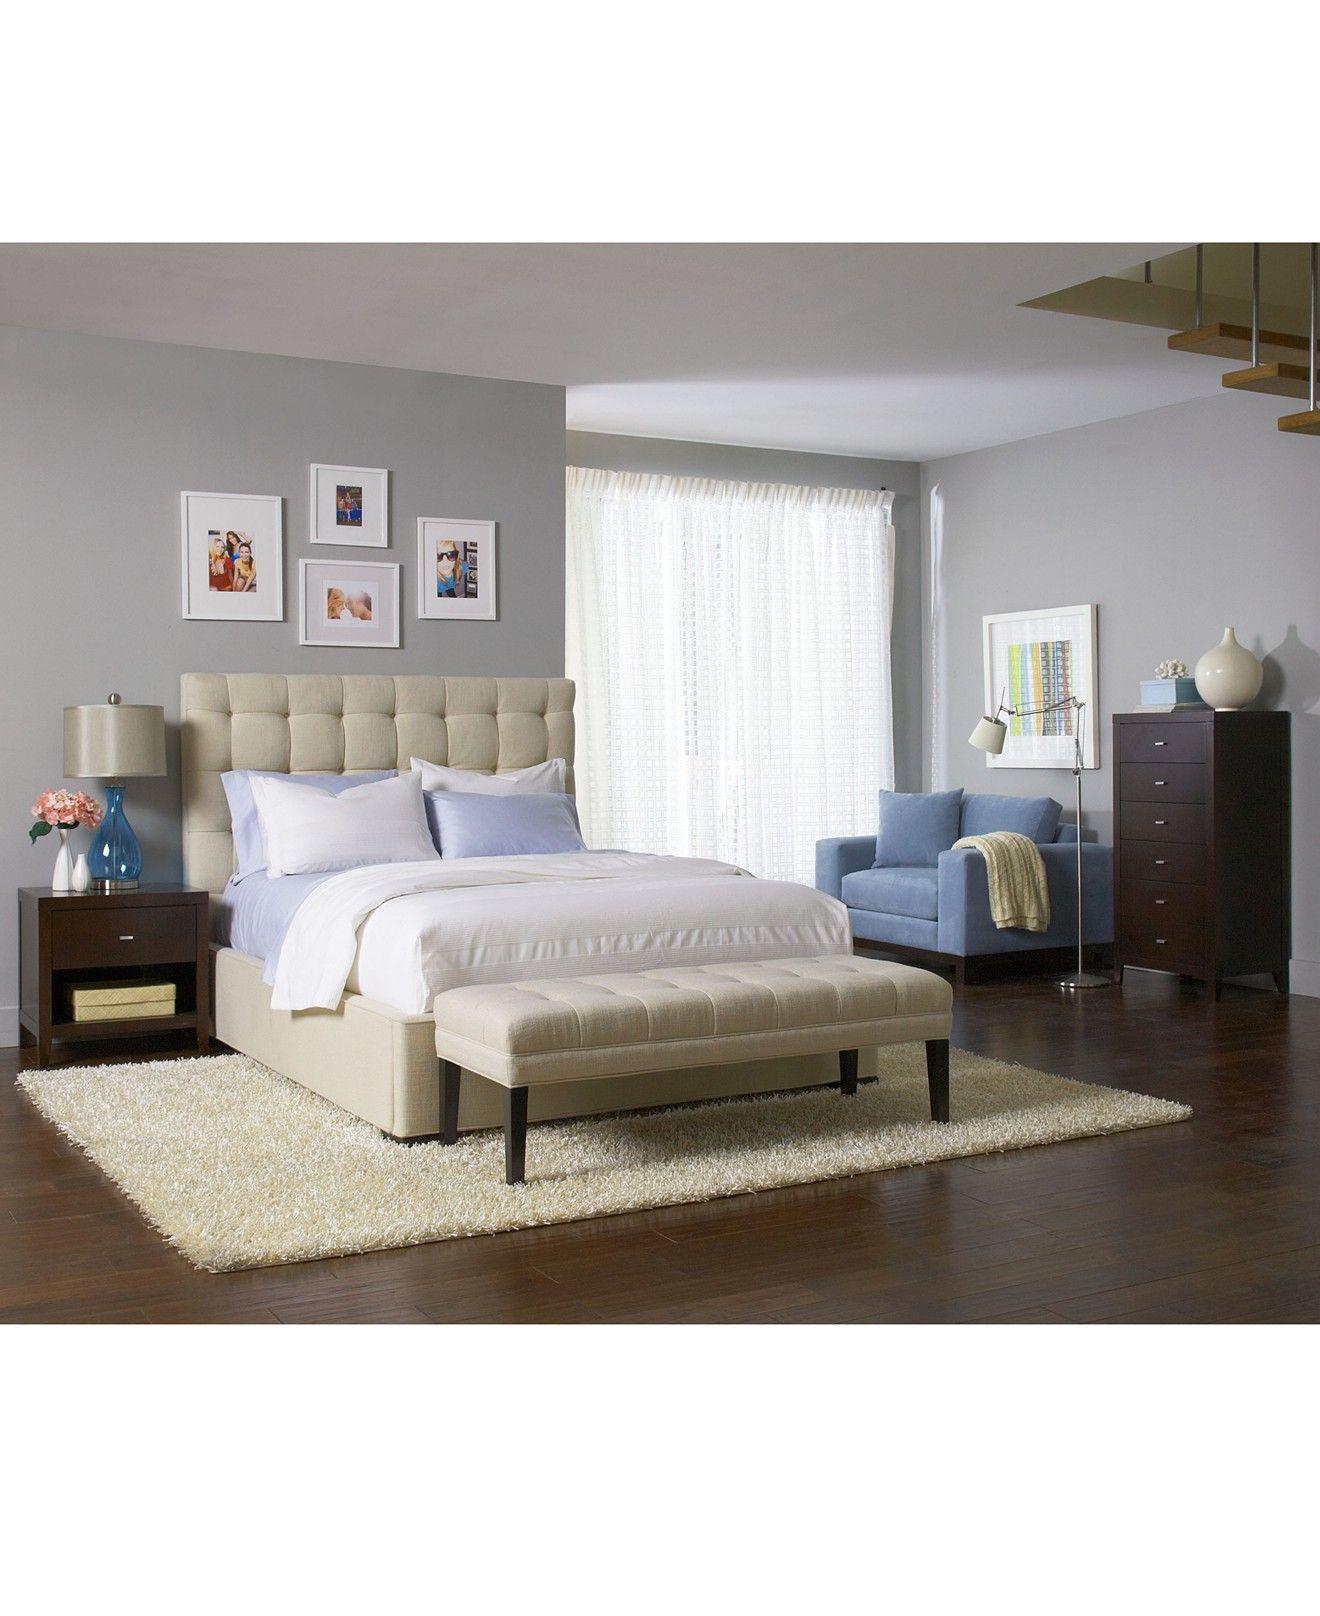 Abby Queen Bed Beds & Headboards Furniture Macy's